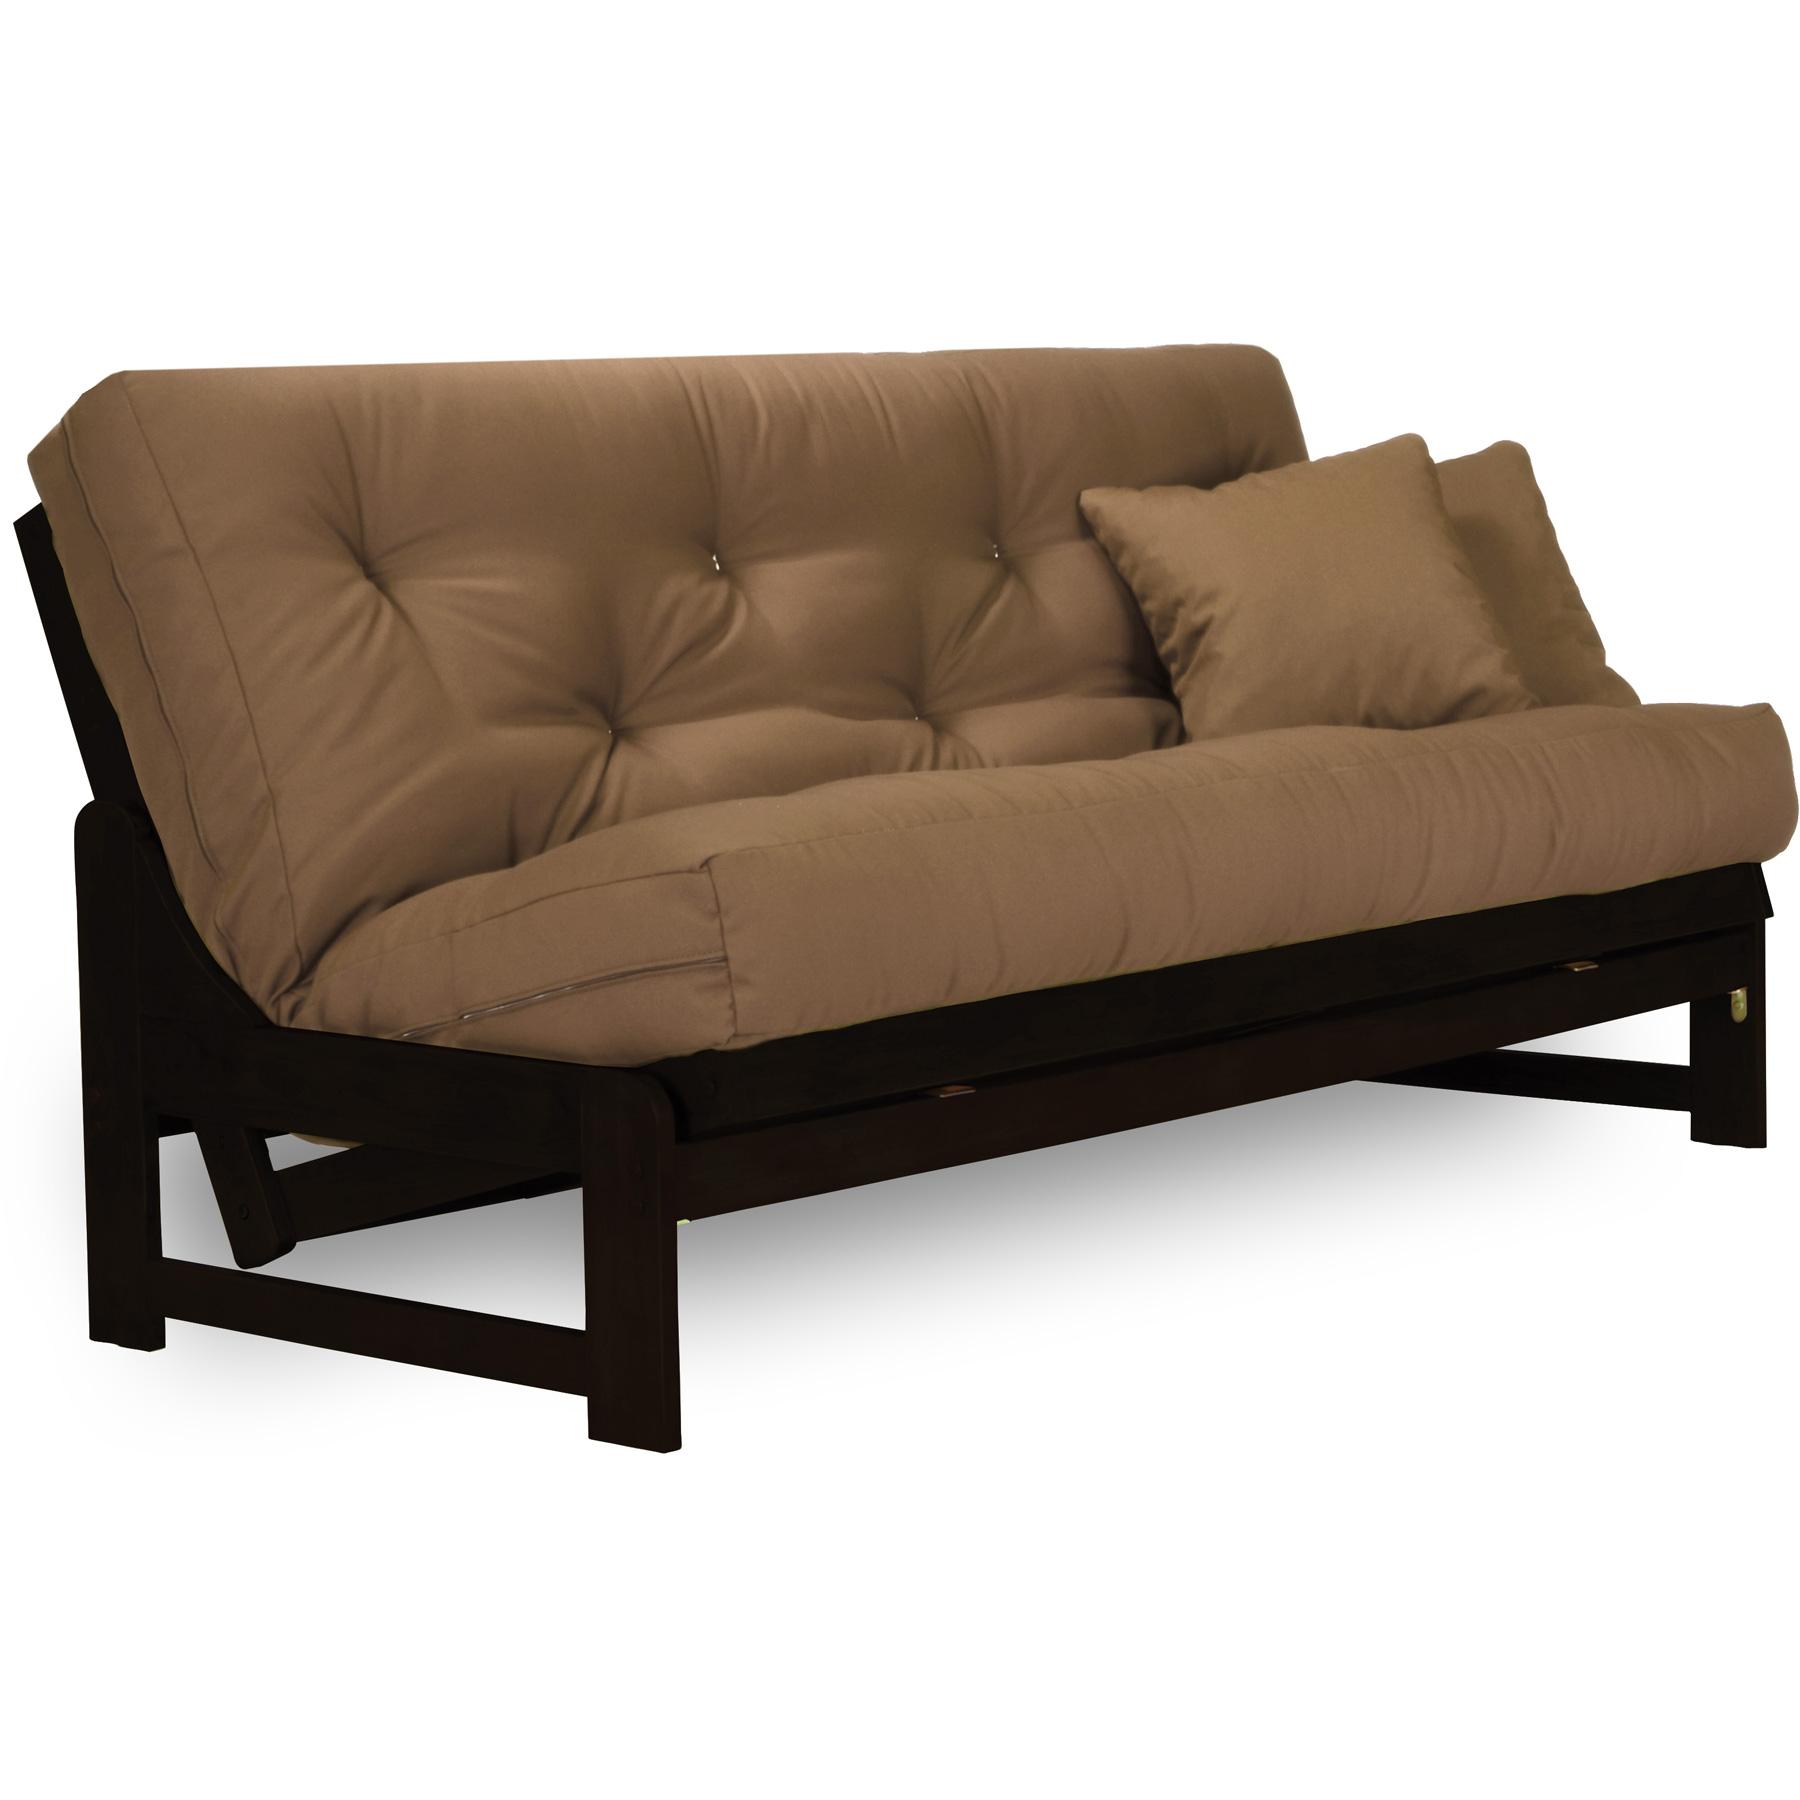 armless arden espresso  plete sit and sleep futon set   wood frame mattress options     armless arden espresso  plete sit and sleep futon set   wood      rh   dcgstores